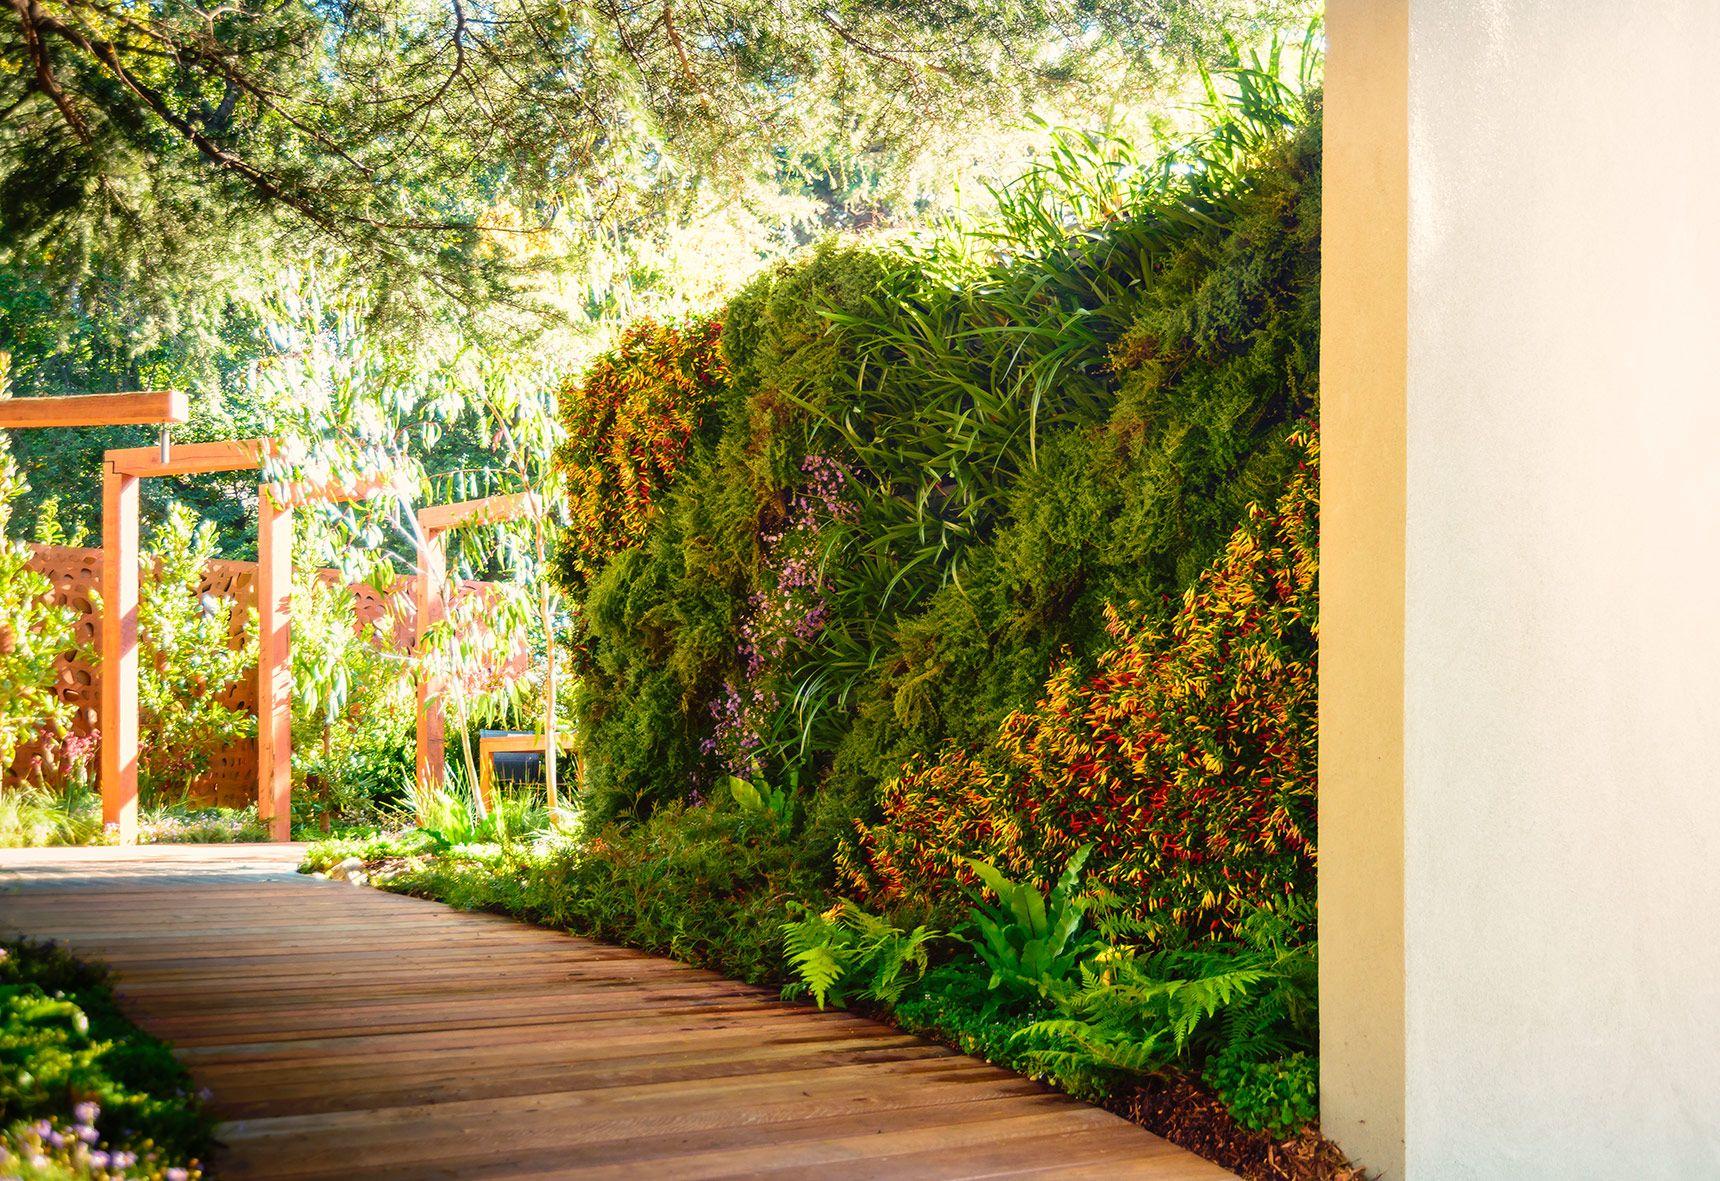 MIFGS - Vertical garden / wall garden / living garden with Herbs ...